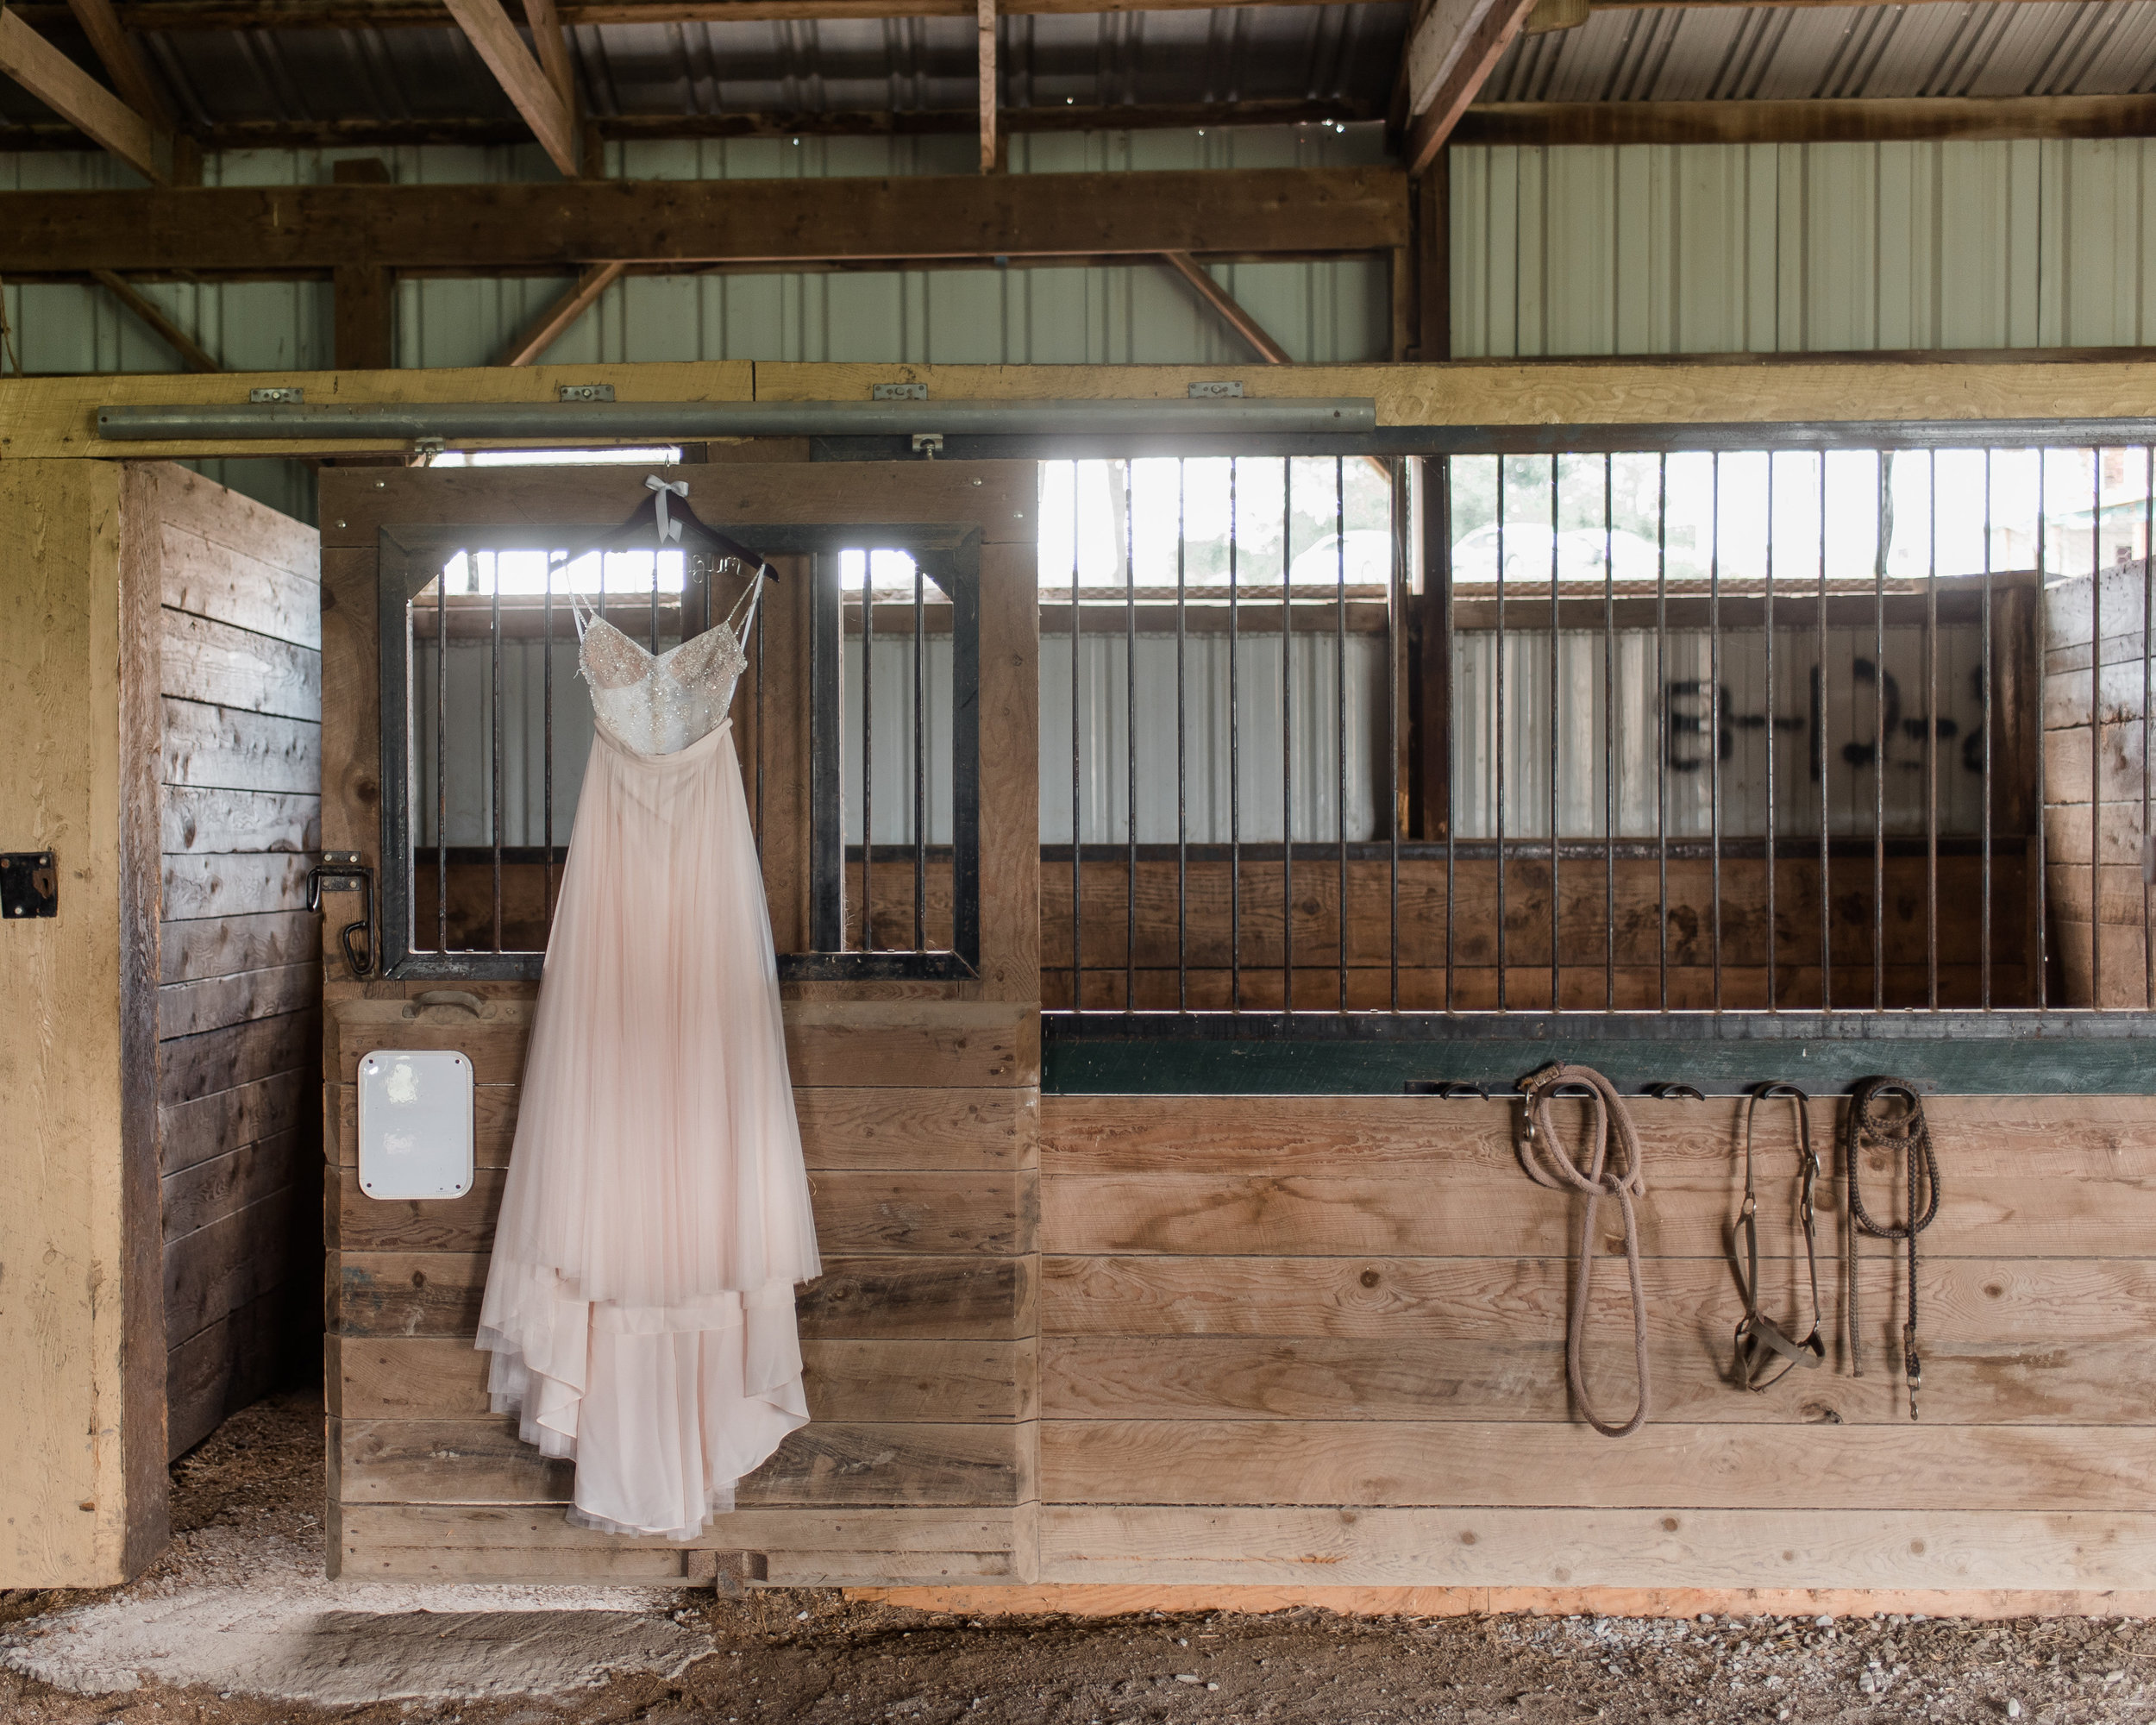 pittsburgh-wedding-photographer-horizonviewfarms-barn-farm-boho-vegan-chic0319.jpg